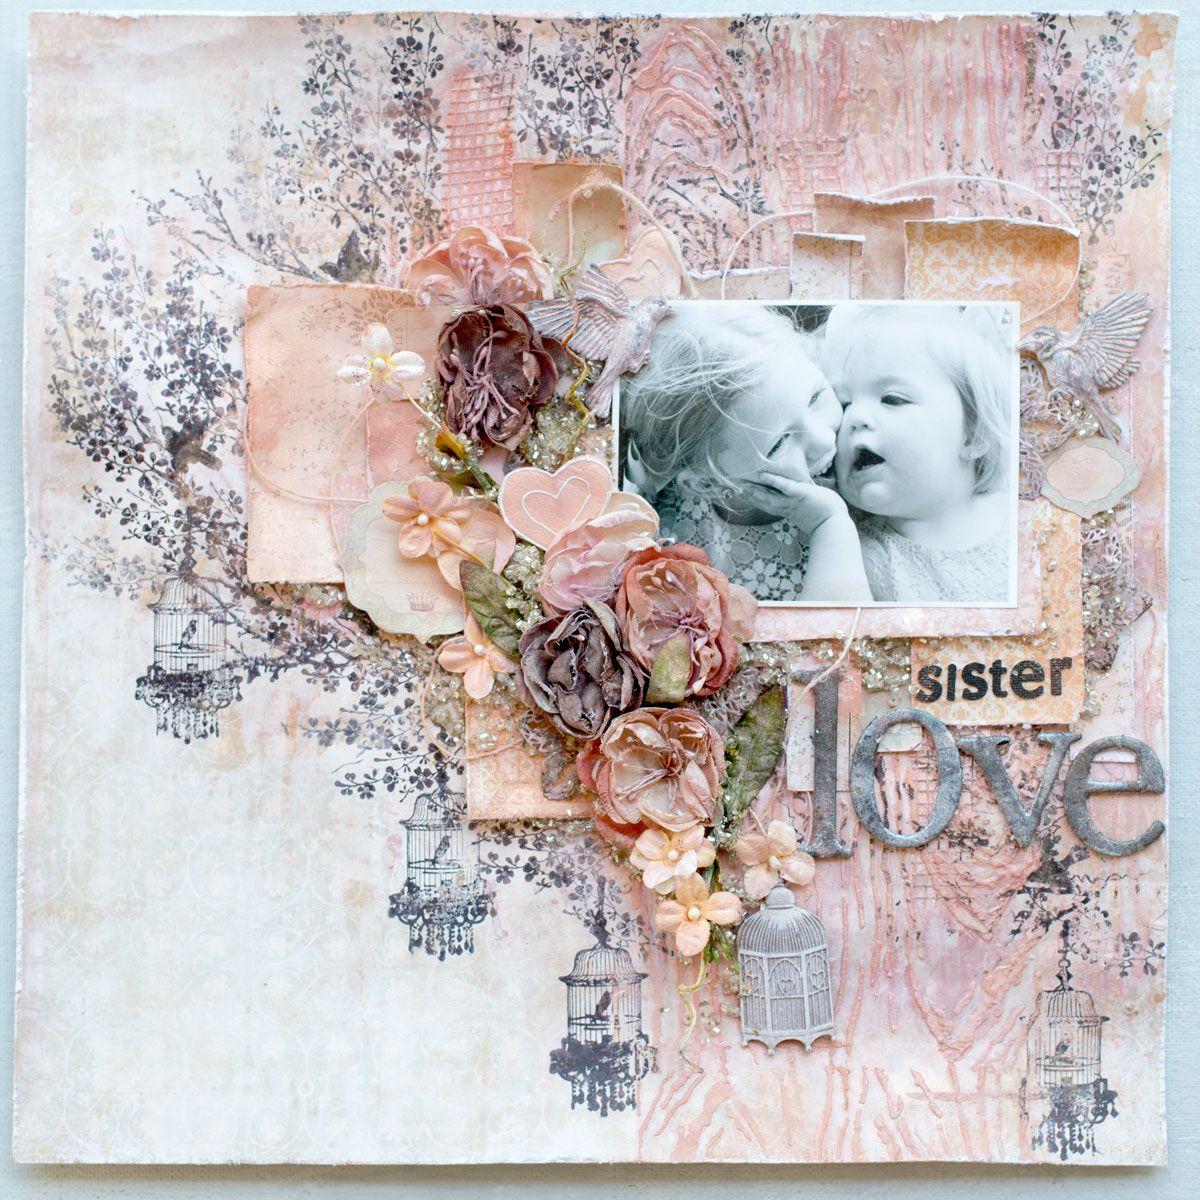 Scrapbook ideas sister - Sister S Love Layout Scrapbook Com